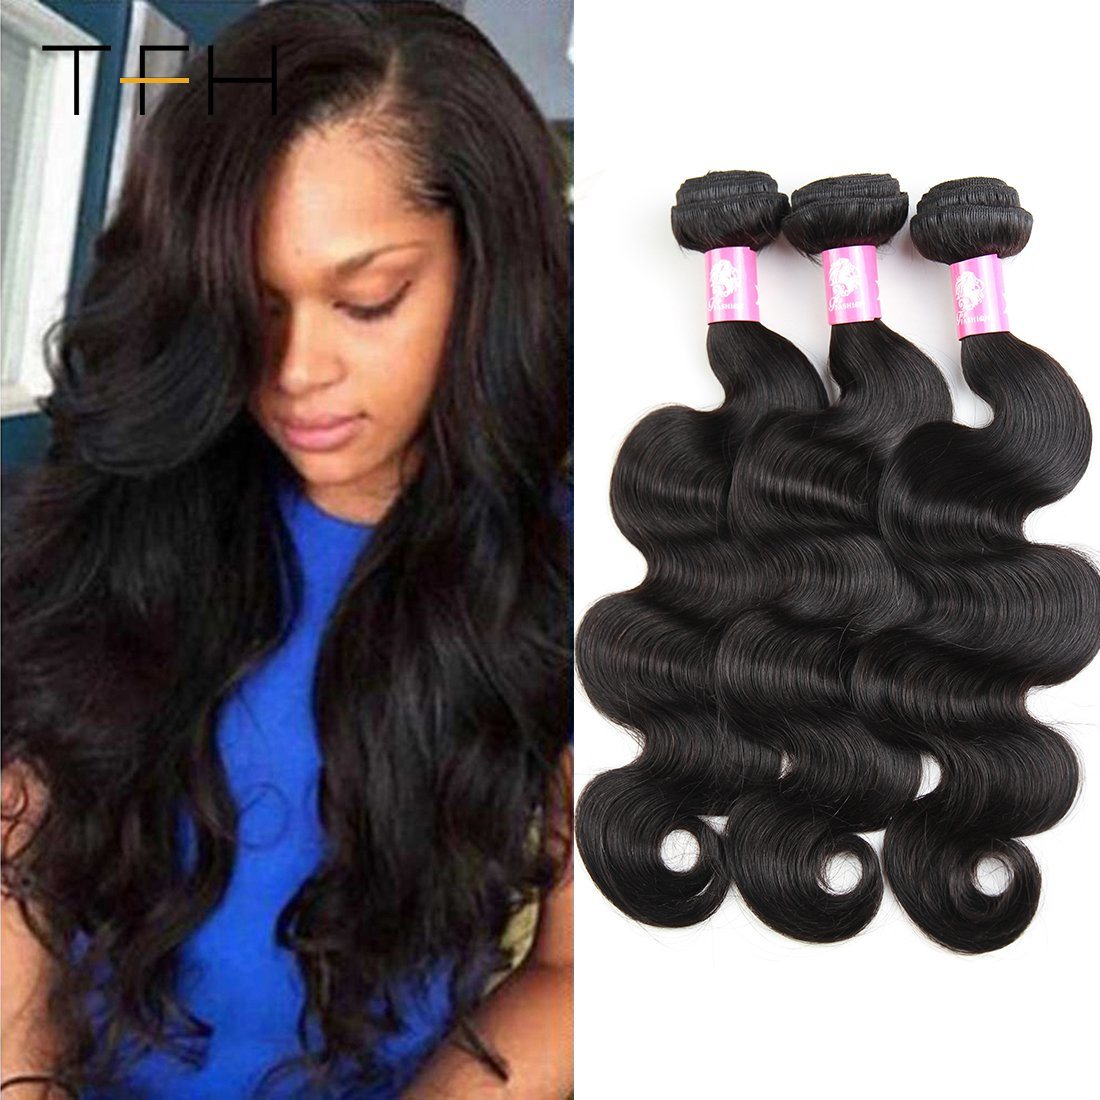 906e7d457b5 [Hot Item] Brazilian Body Wave Hair Extensions Natural Color 100% Remy  Human Hair Weave Bundles